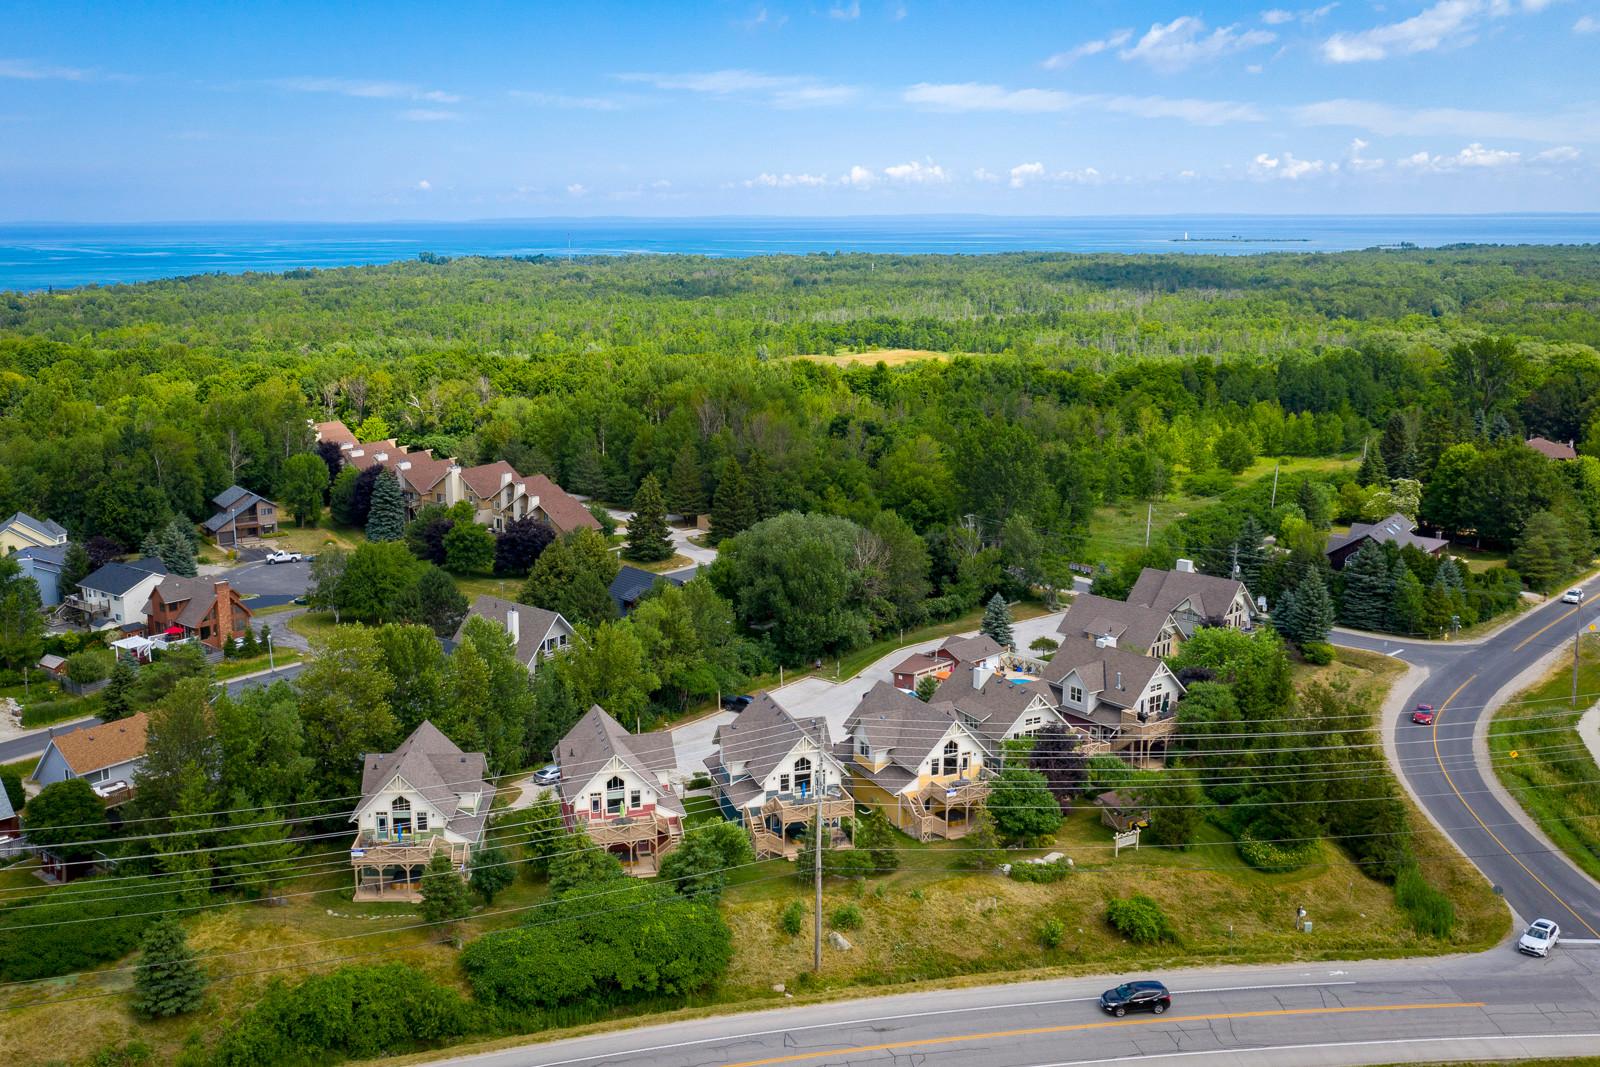 Blue View Chalets 104 Brooker Aerial 1.j